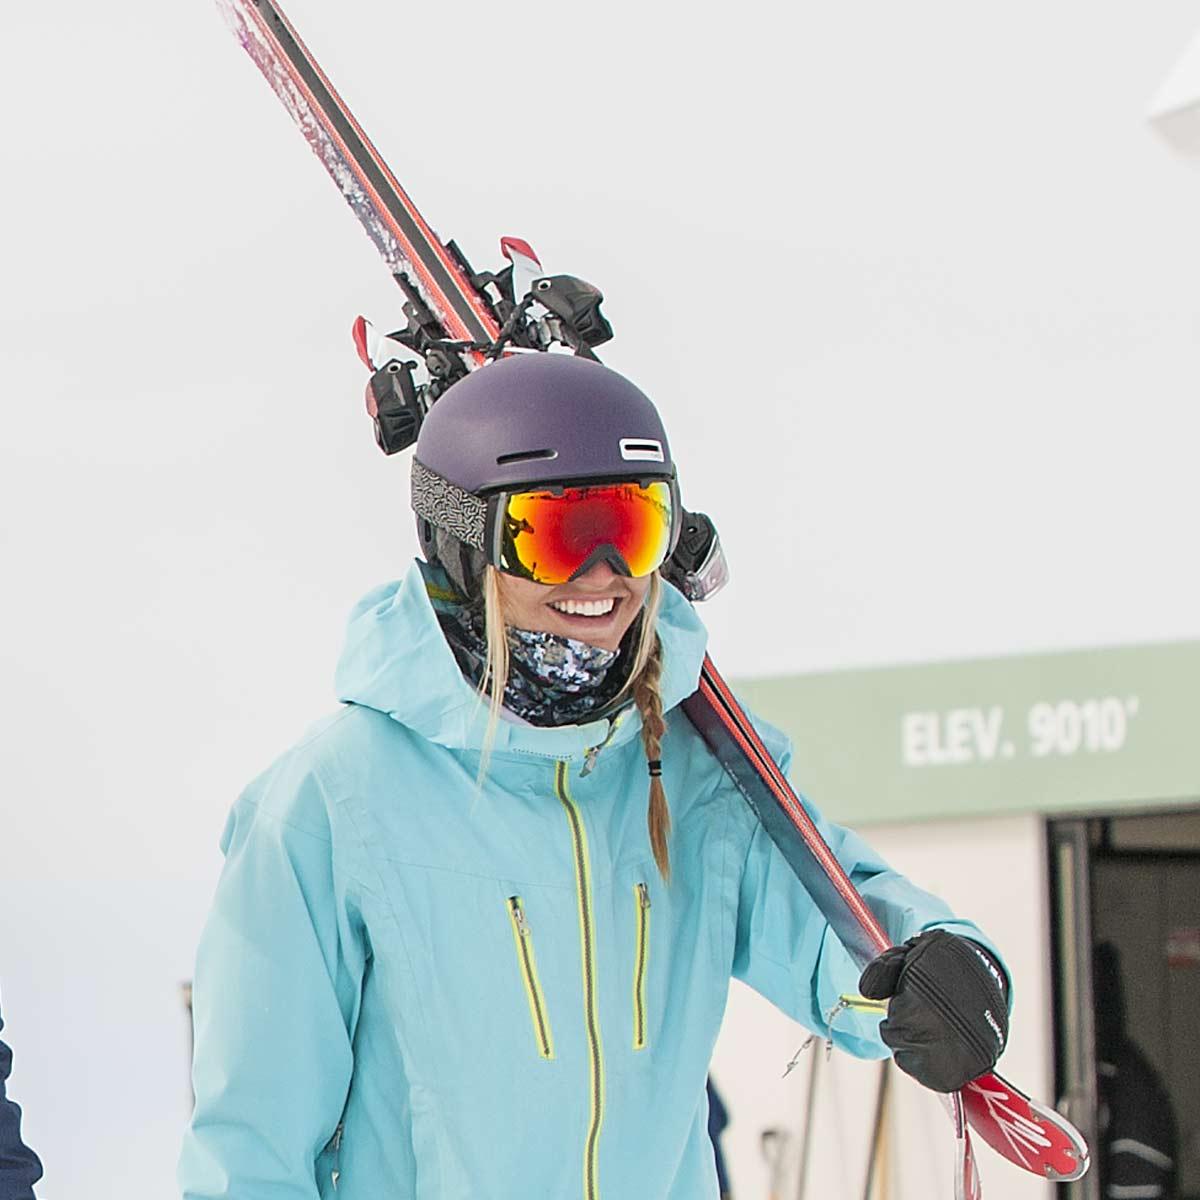 Smith Allure Ski Helmet On Sale Powder7 Ski Shop